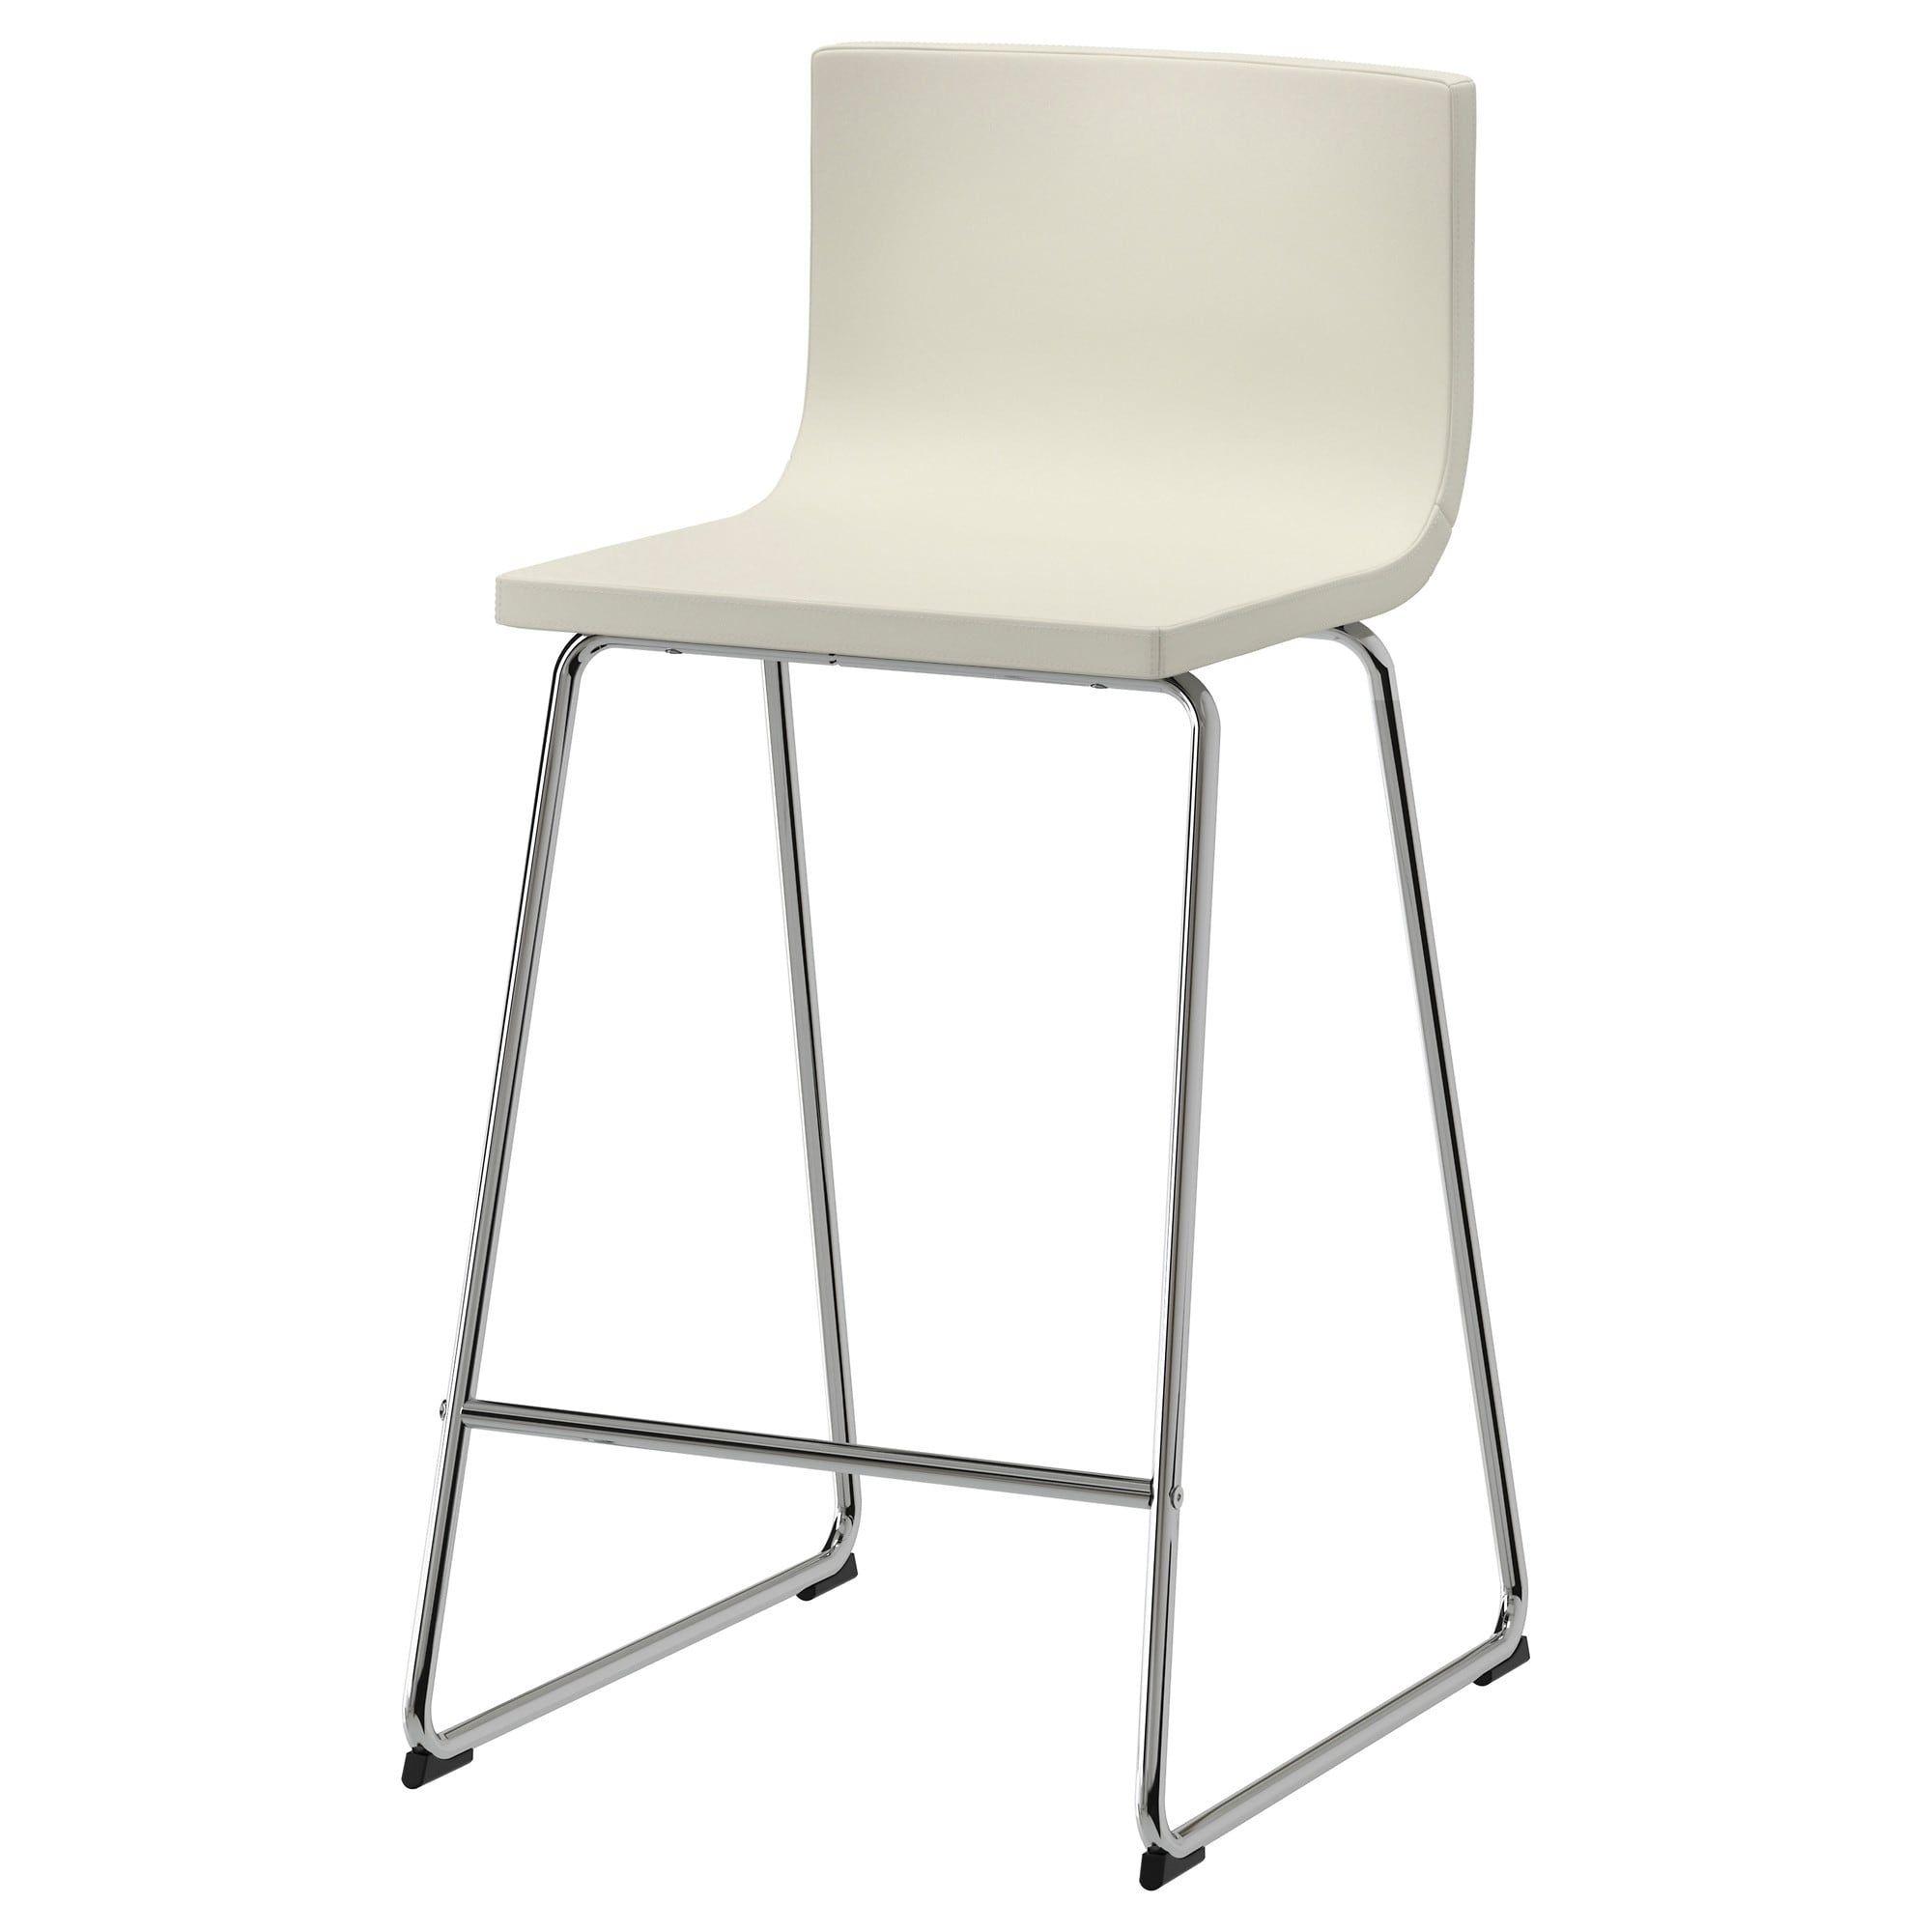 Bernhard Bar Stool With Backrest Chrome Plated Mjuk Kavat White